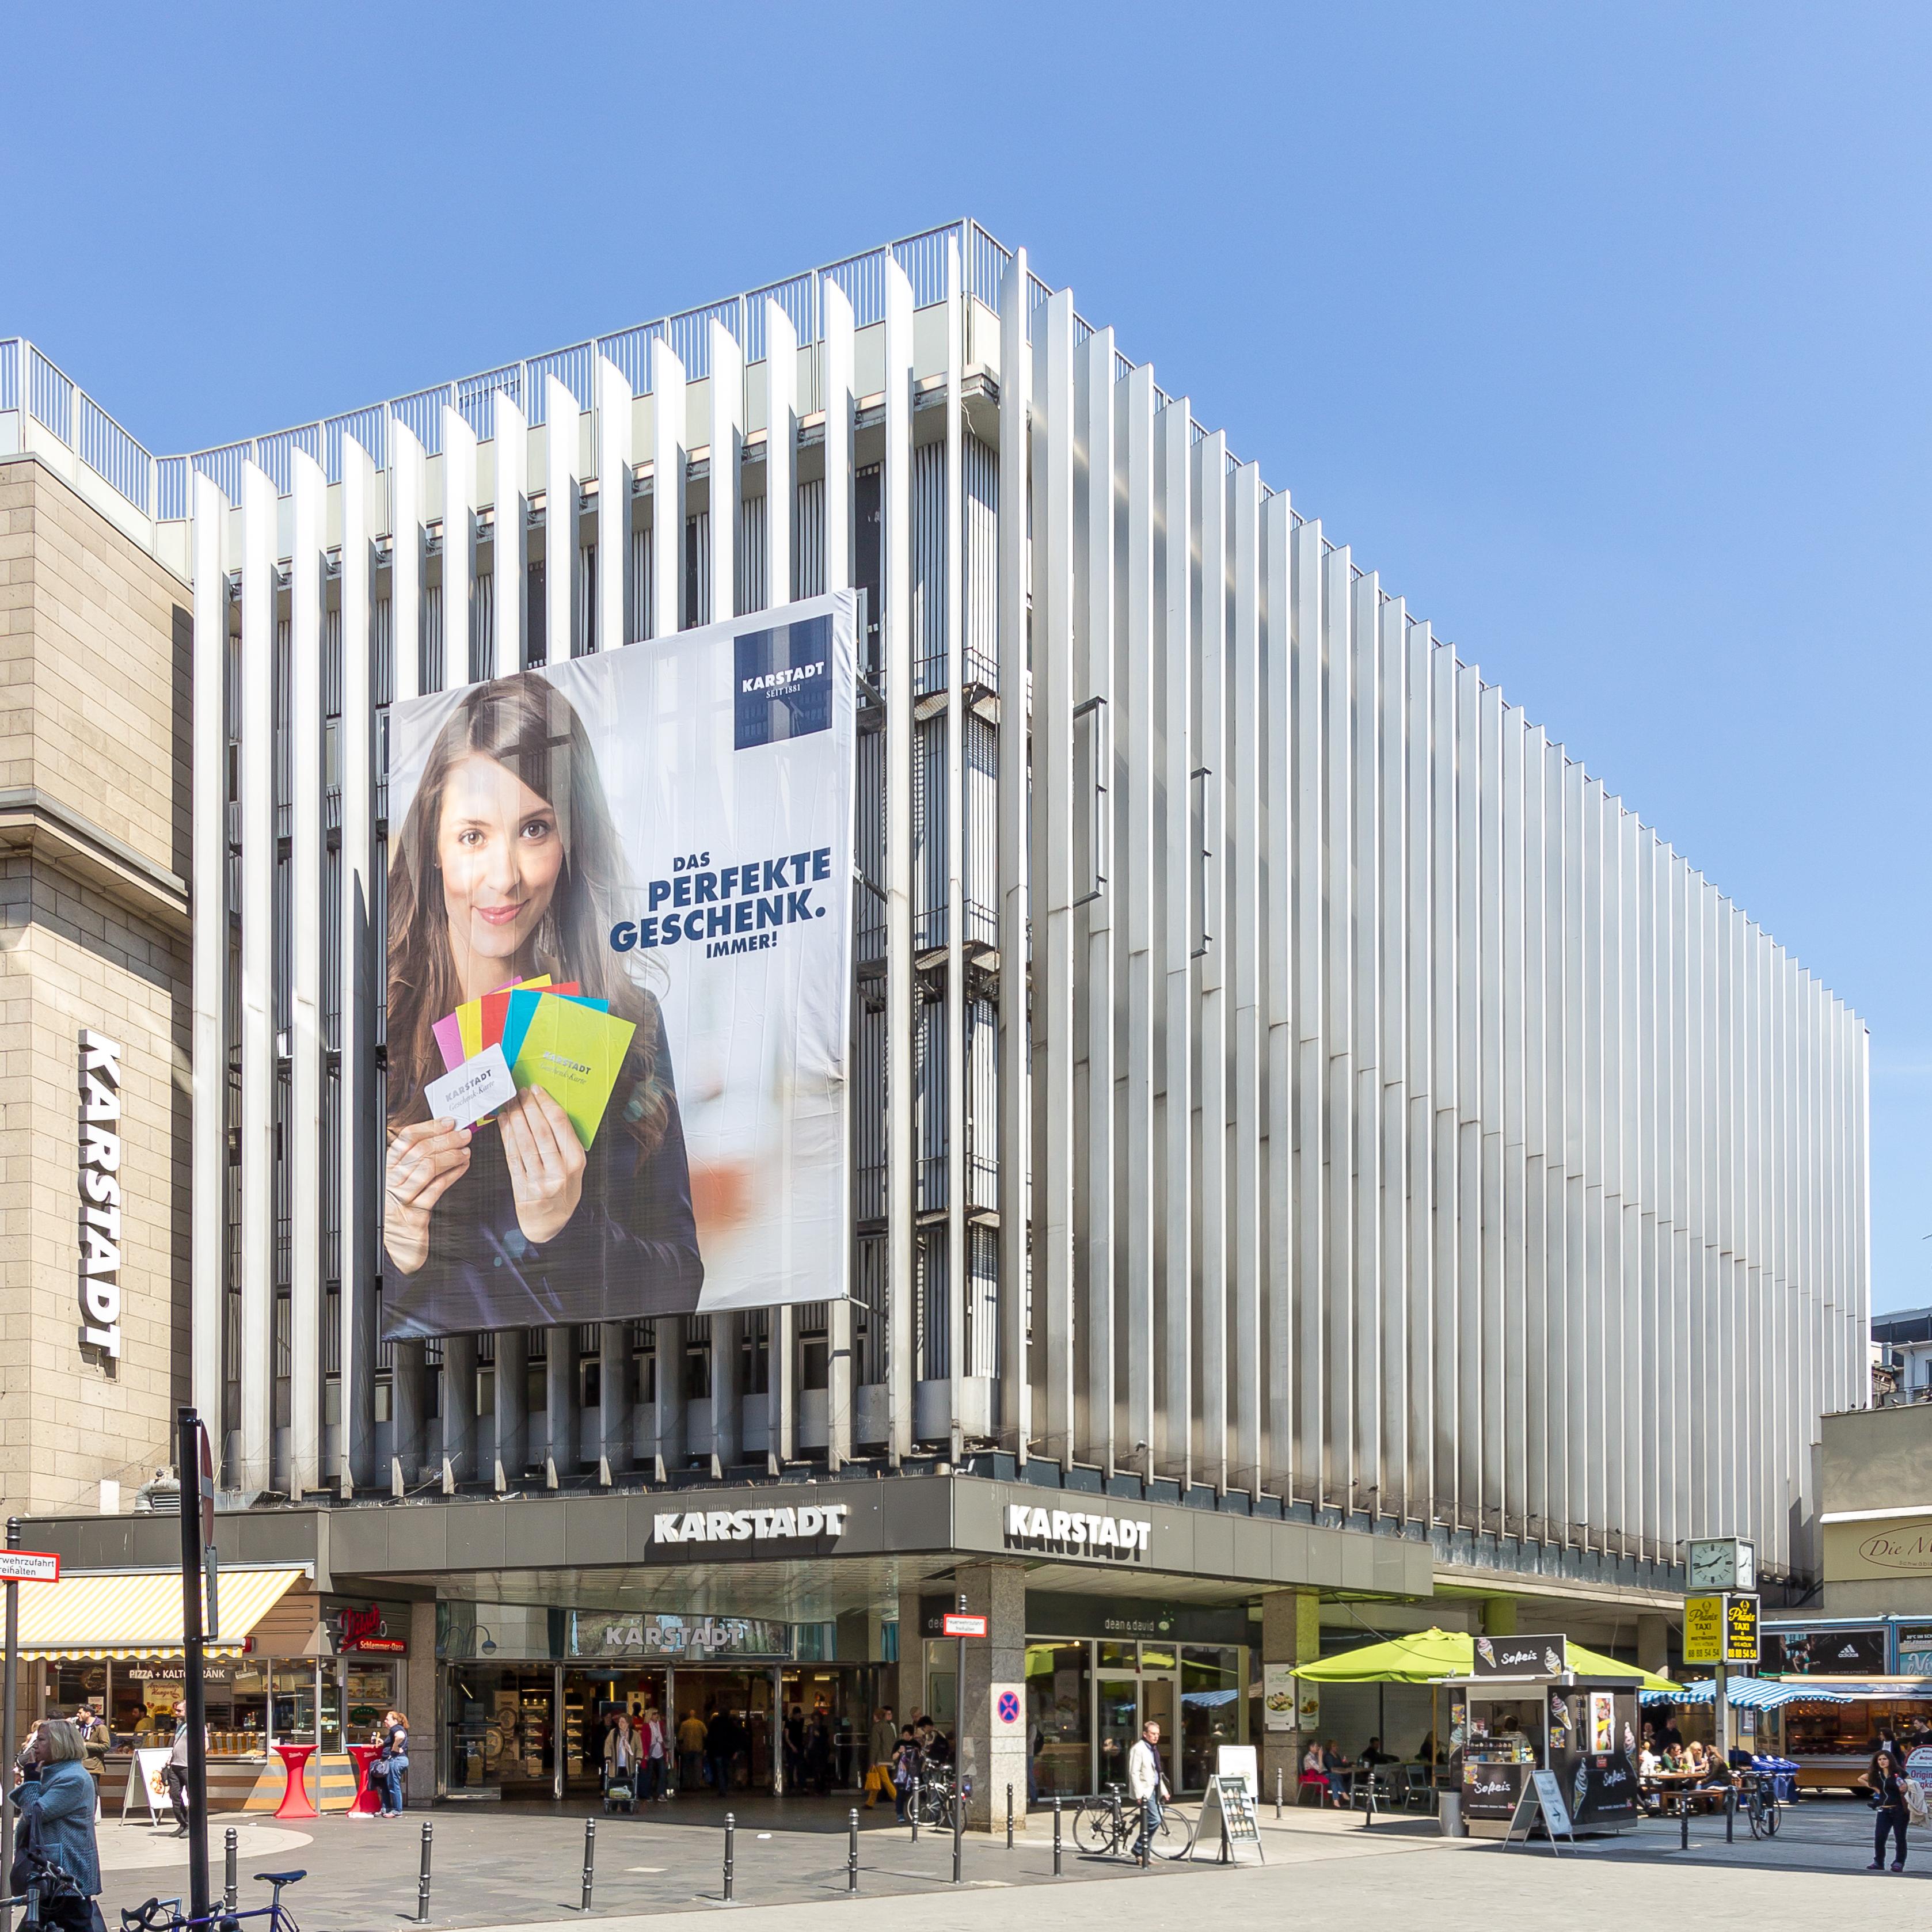 Karstadt Koeln